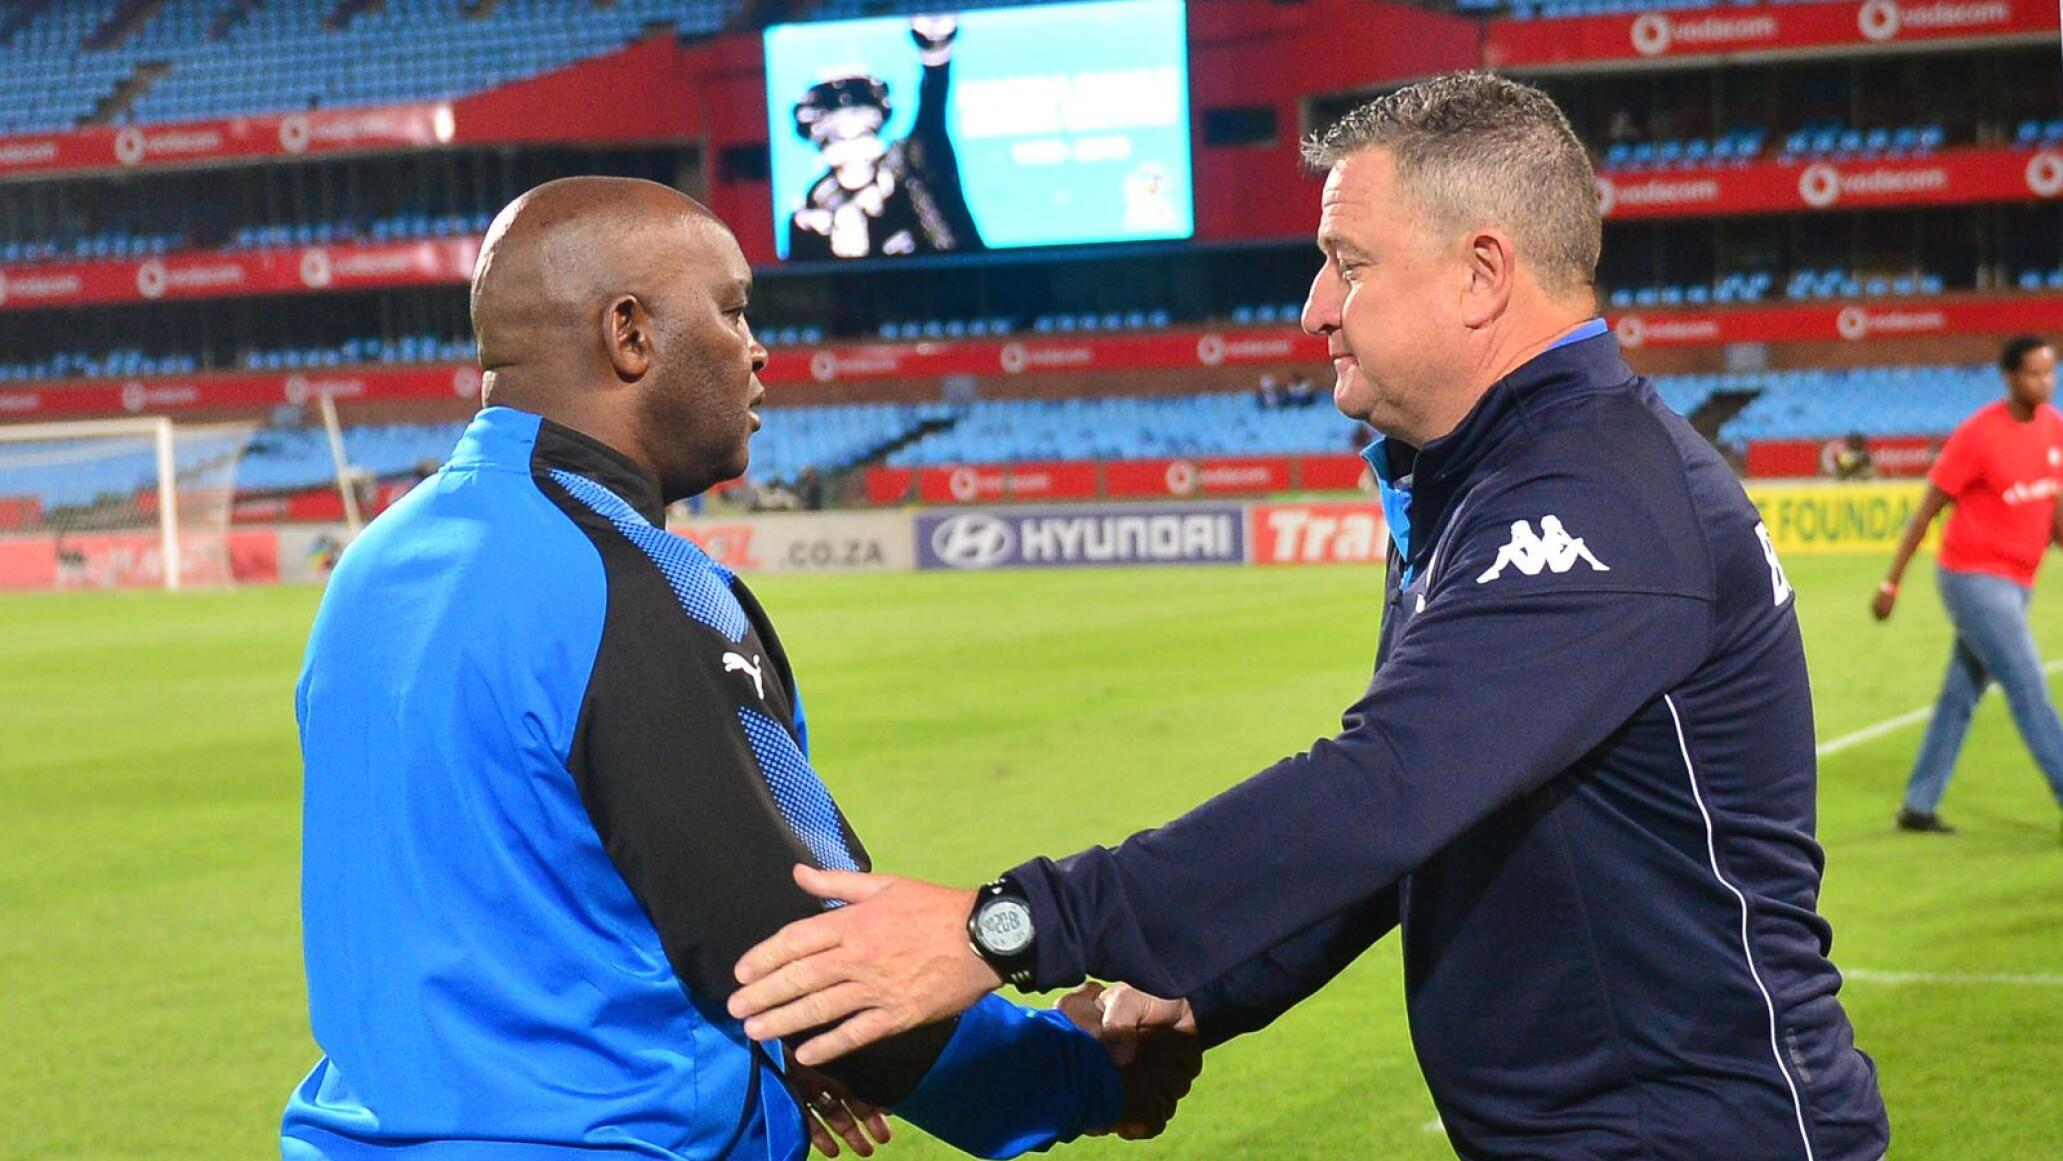 Al Ahly coach Pitso Mosimane says Gavin Hunt deserves all the plaudits